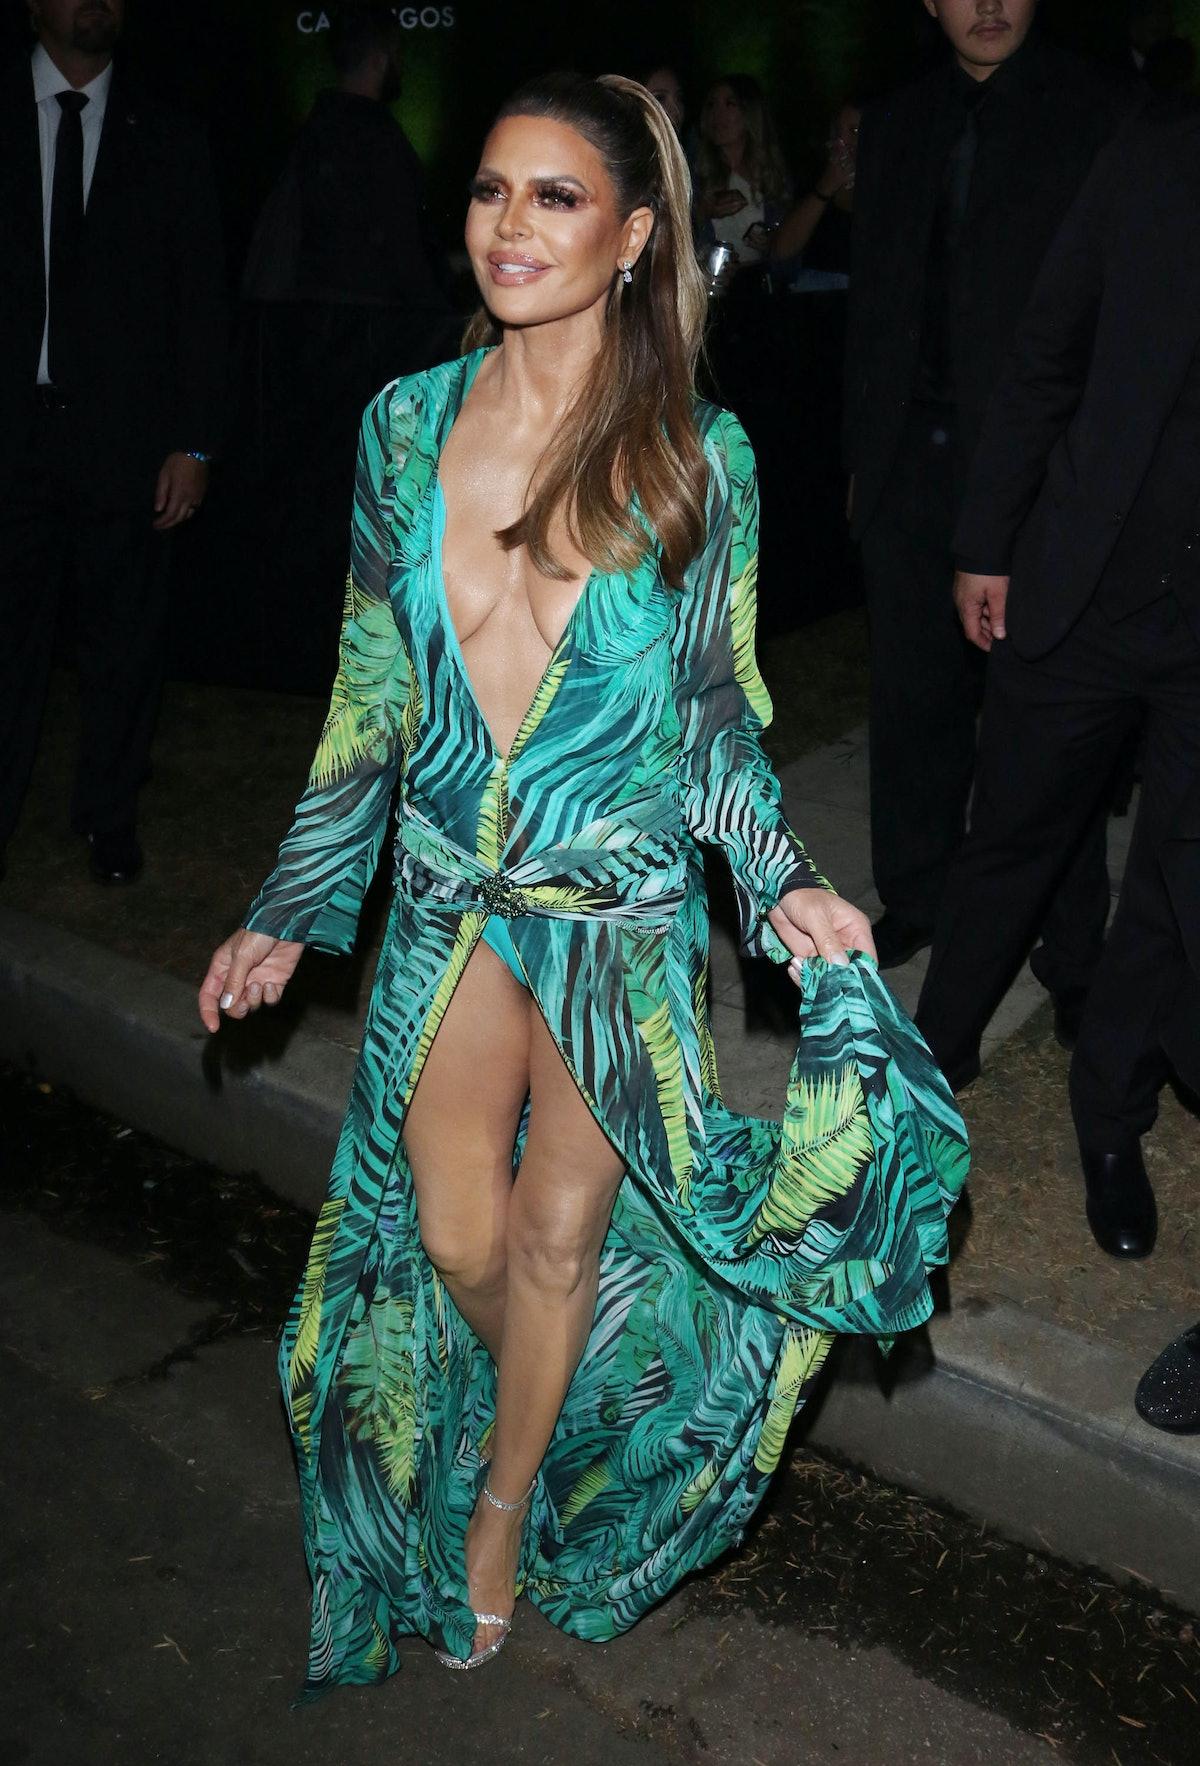 Celebrity Sightings in Los Angeles, California - October 25, 2019